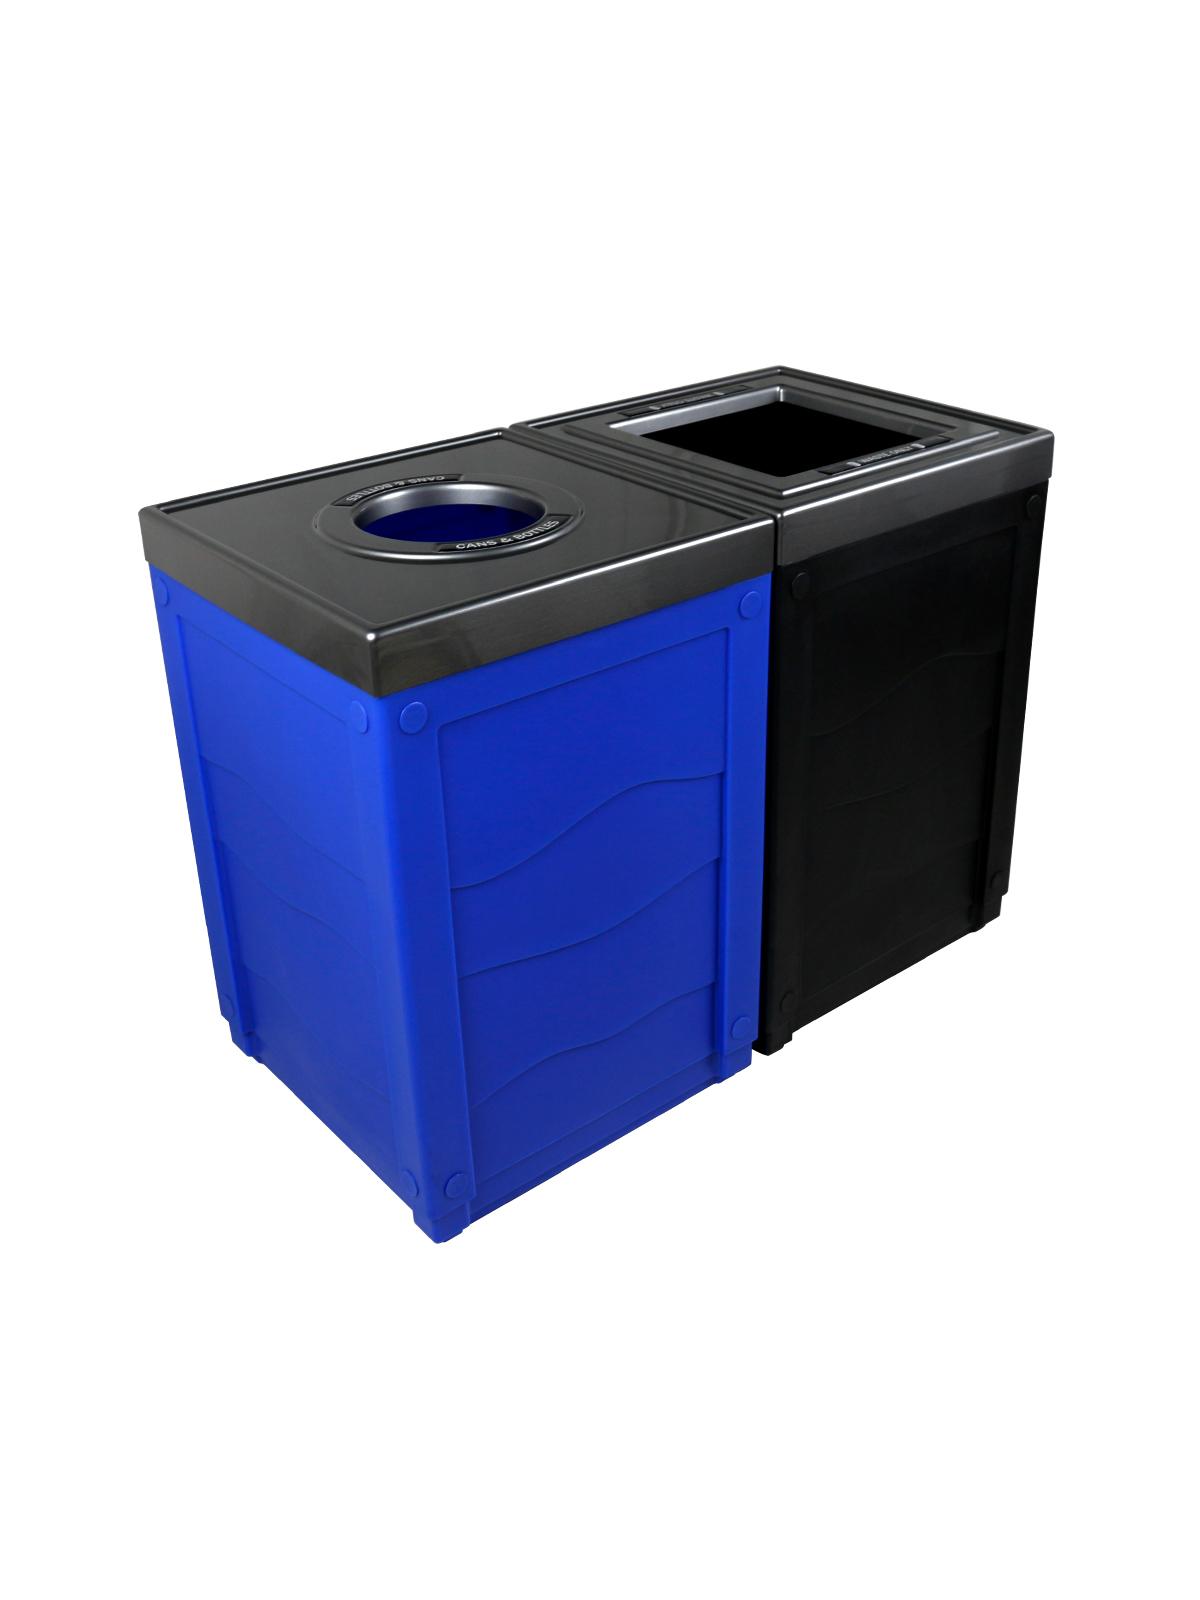 EVOLVE - Double - Cans & Bottles-Waste - Circle-Full - Blue-Black